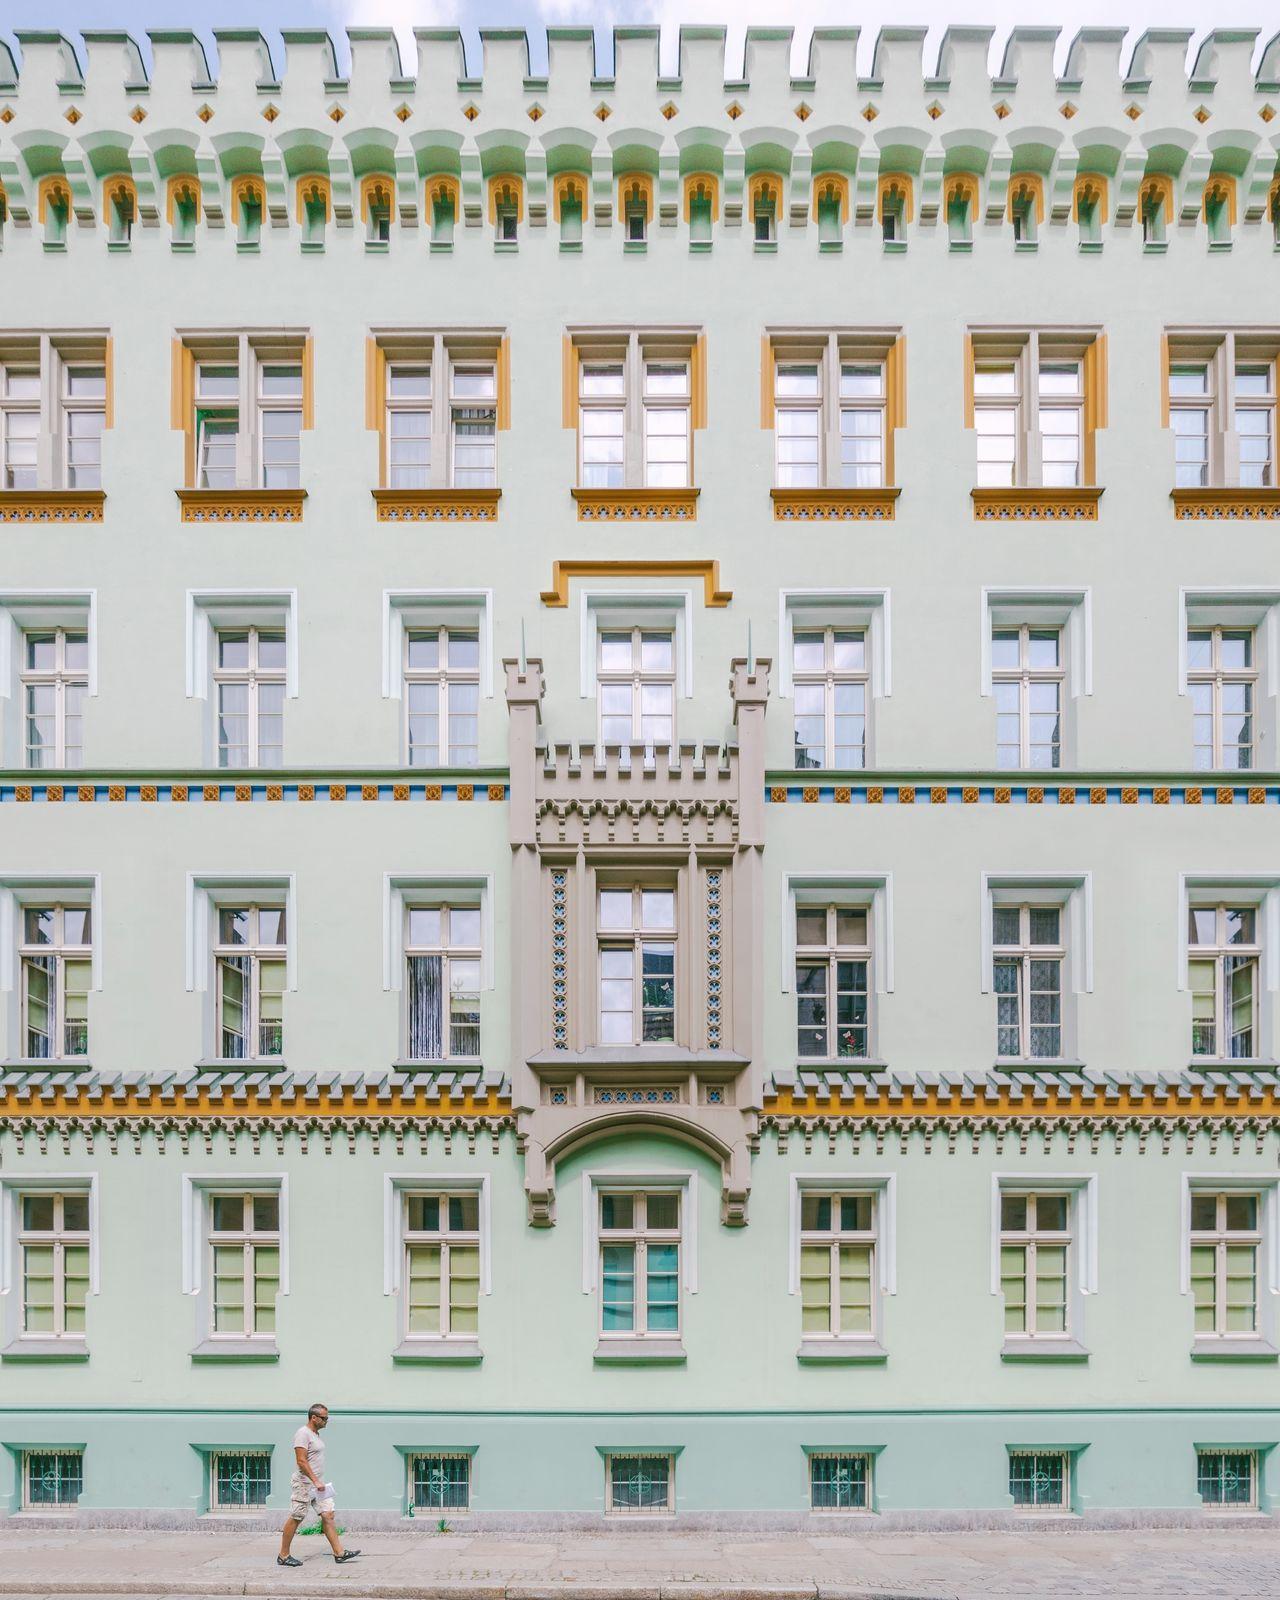 building exterior, architecture, window, balcony, built structure